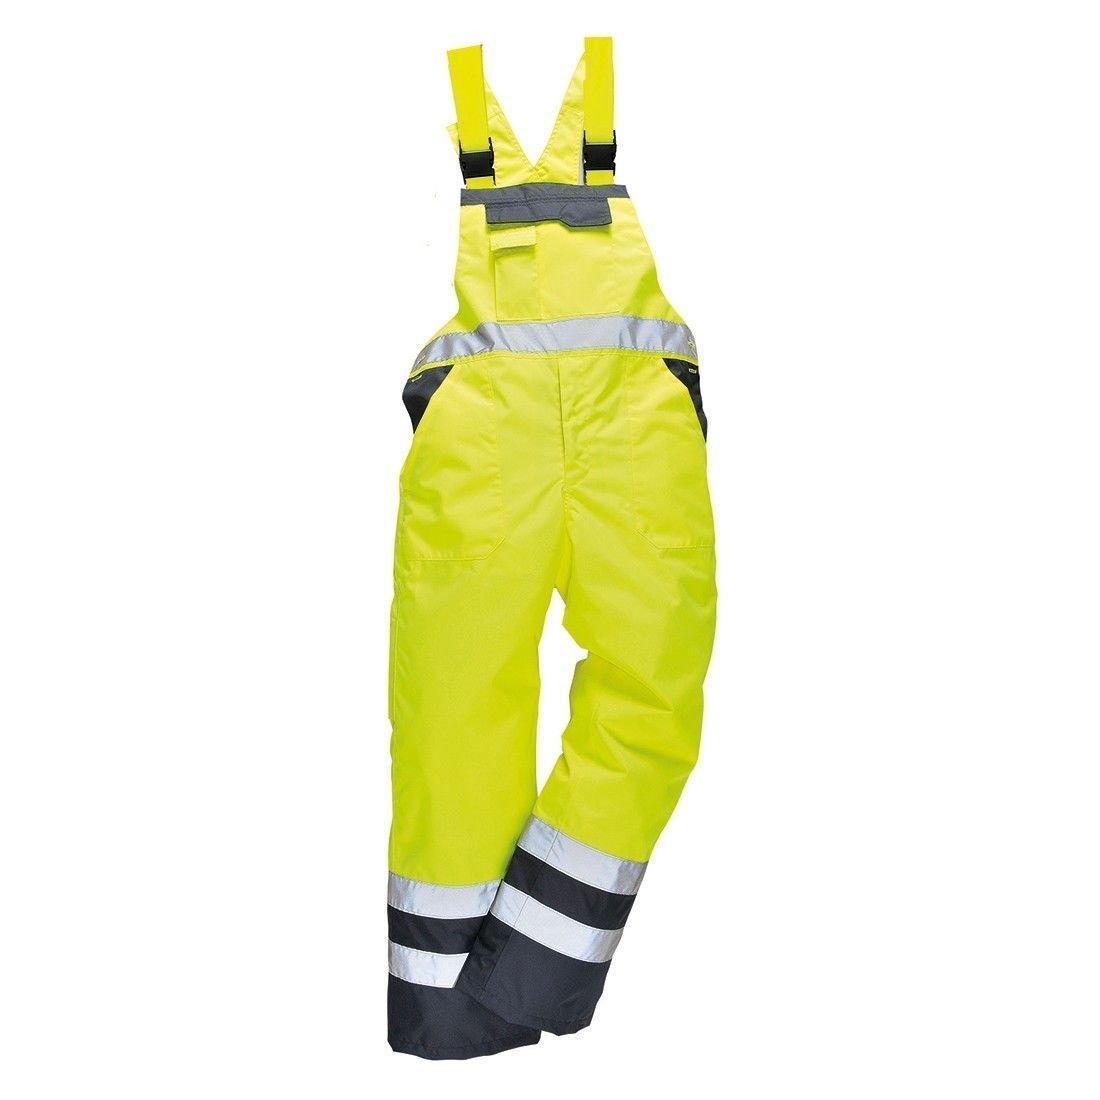 Stormway® Men's Hi VIS Contrast Bib and Brace Waterproof Workwear Ulined Dungarees Overall SW-4880.